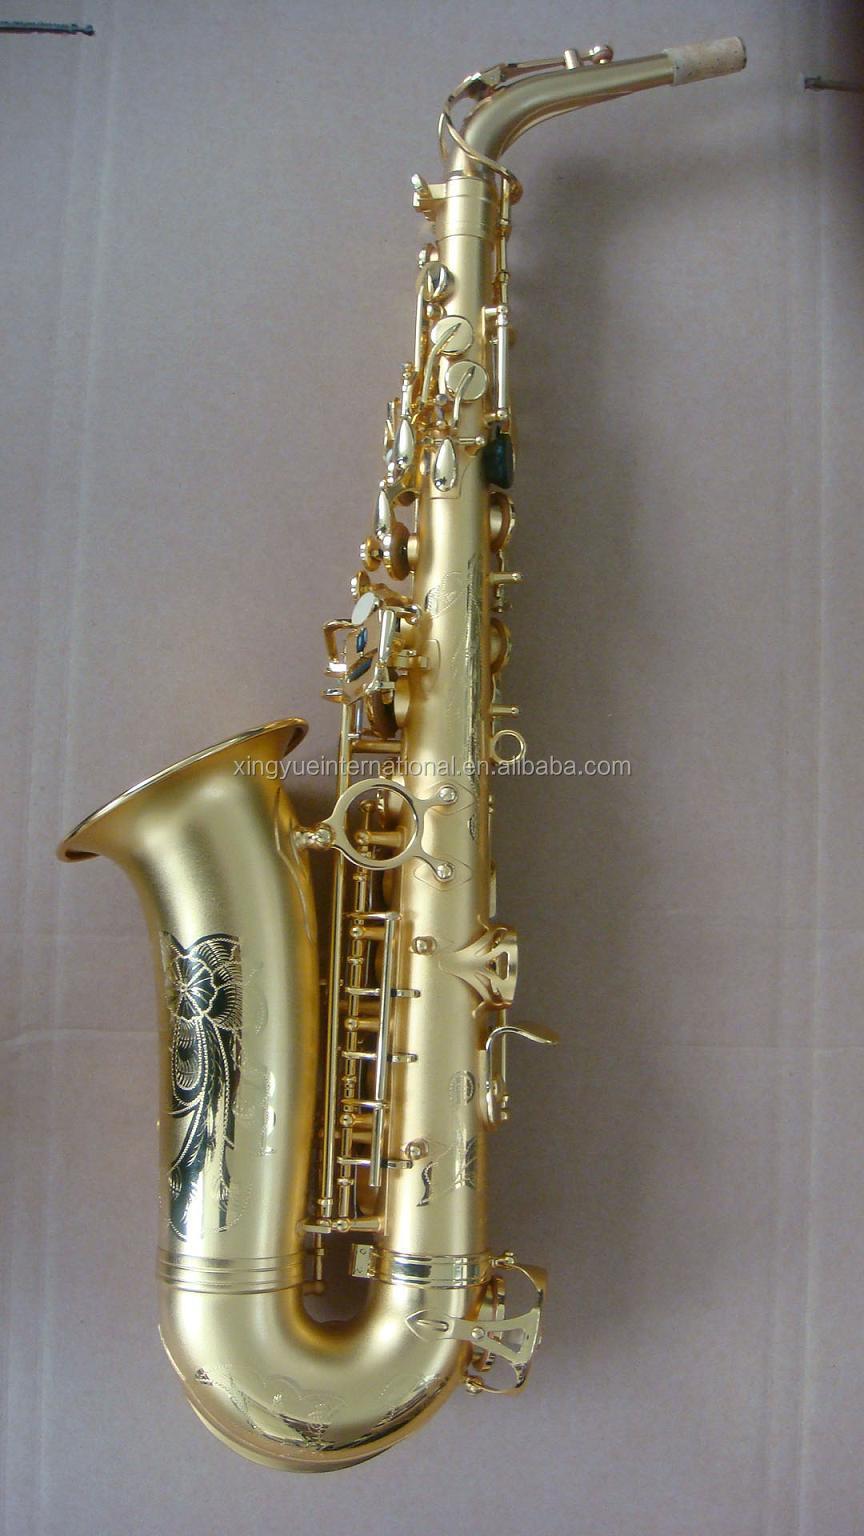 china alto saxophone cheap price buy china alto saxophone alto saxophone saxophone cheap. Black Bedroom Furniture Sets. Home Design Ideas